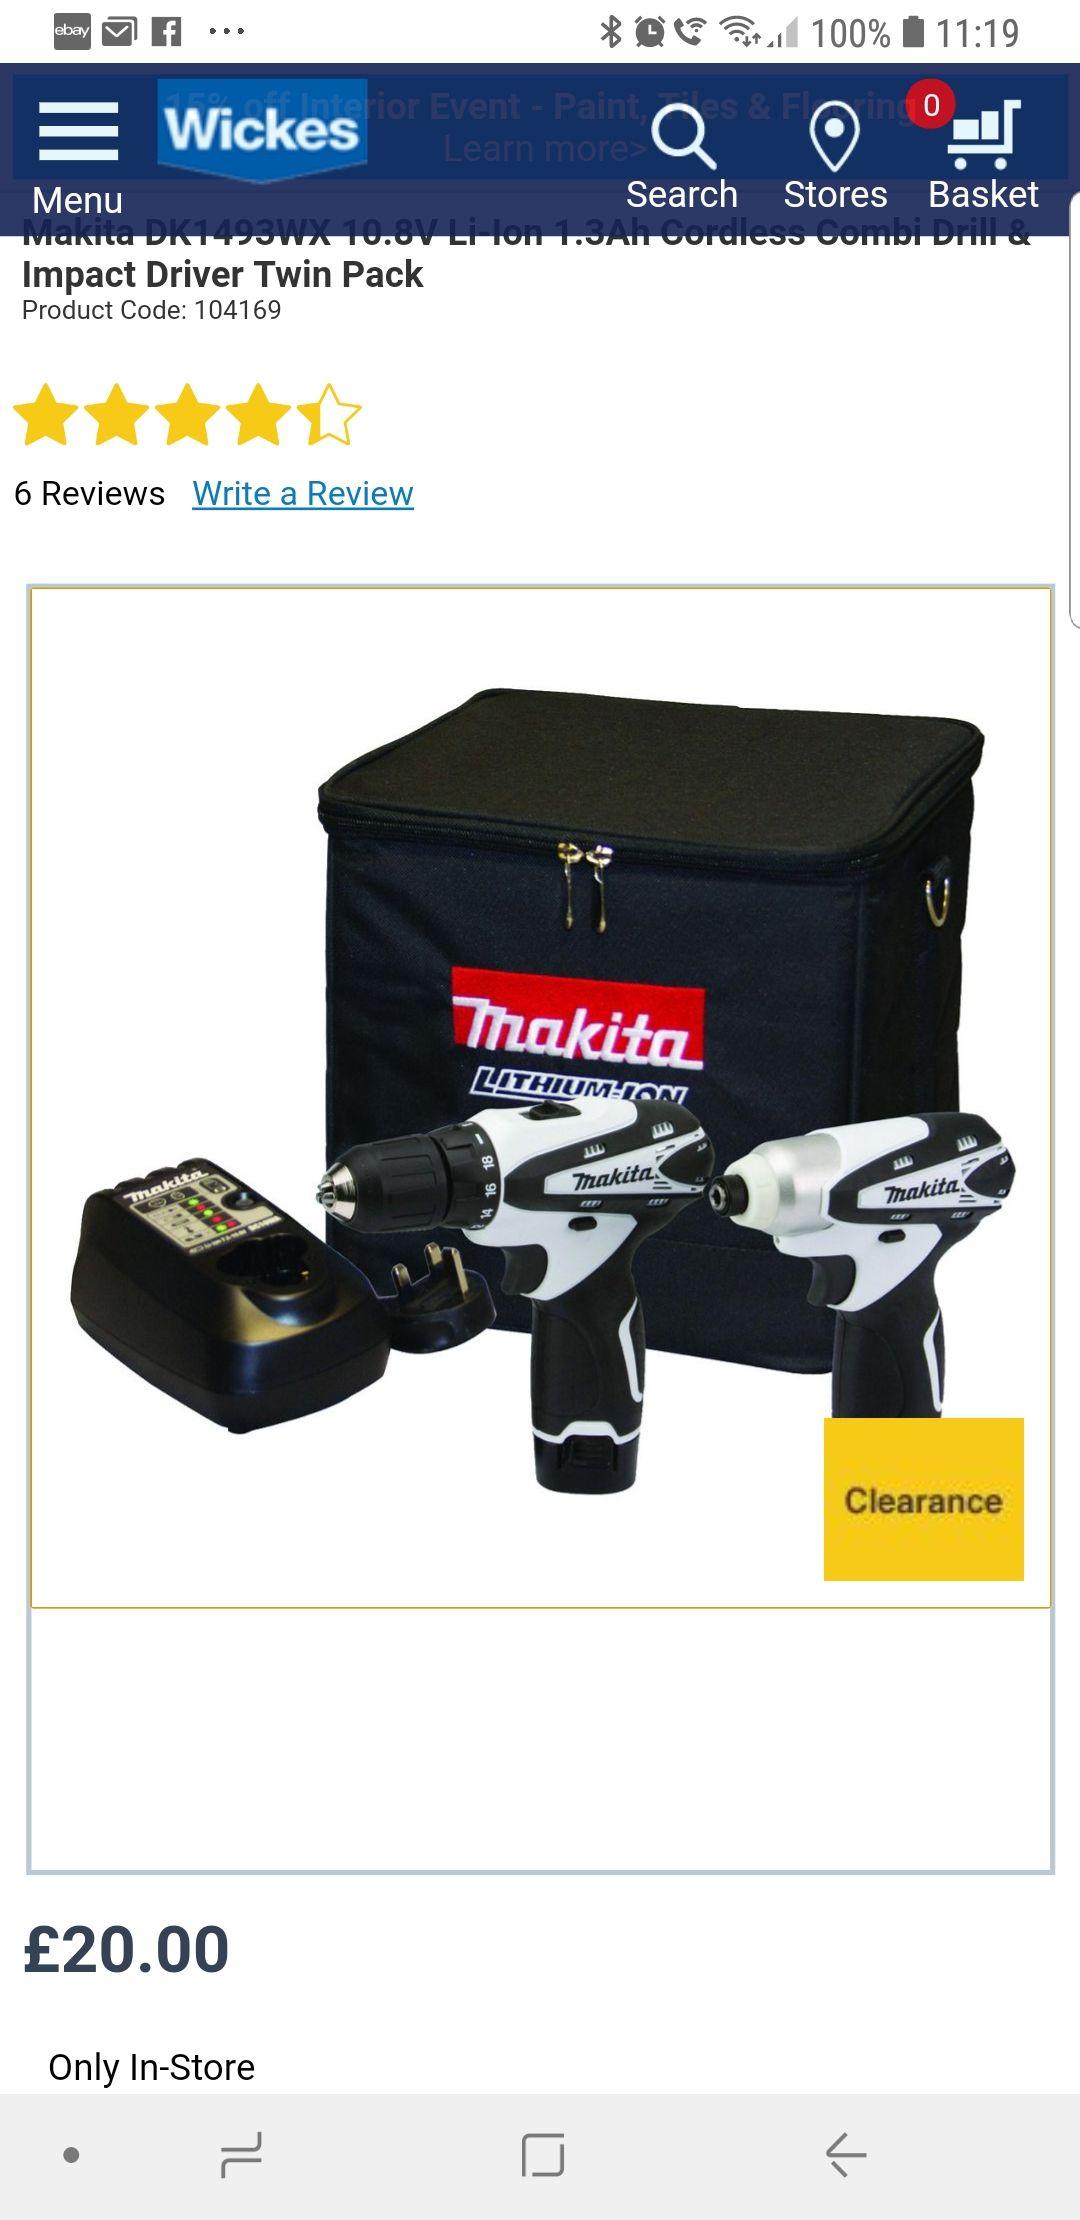 Makita DK1493WX 10.8V Li-Ion 1.3Ah Cordless Combi Drill & Impact Driver Twin Pack £20 @ Wickes